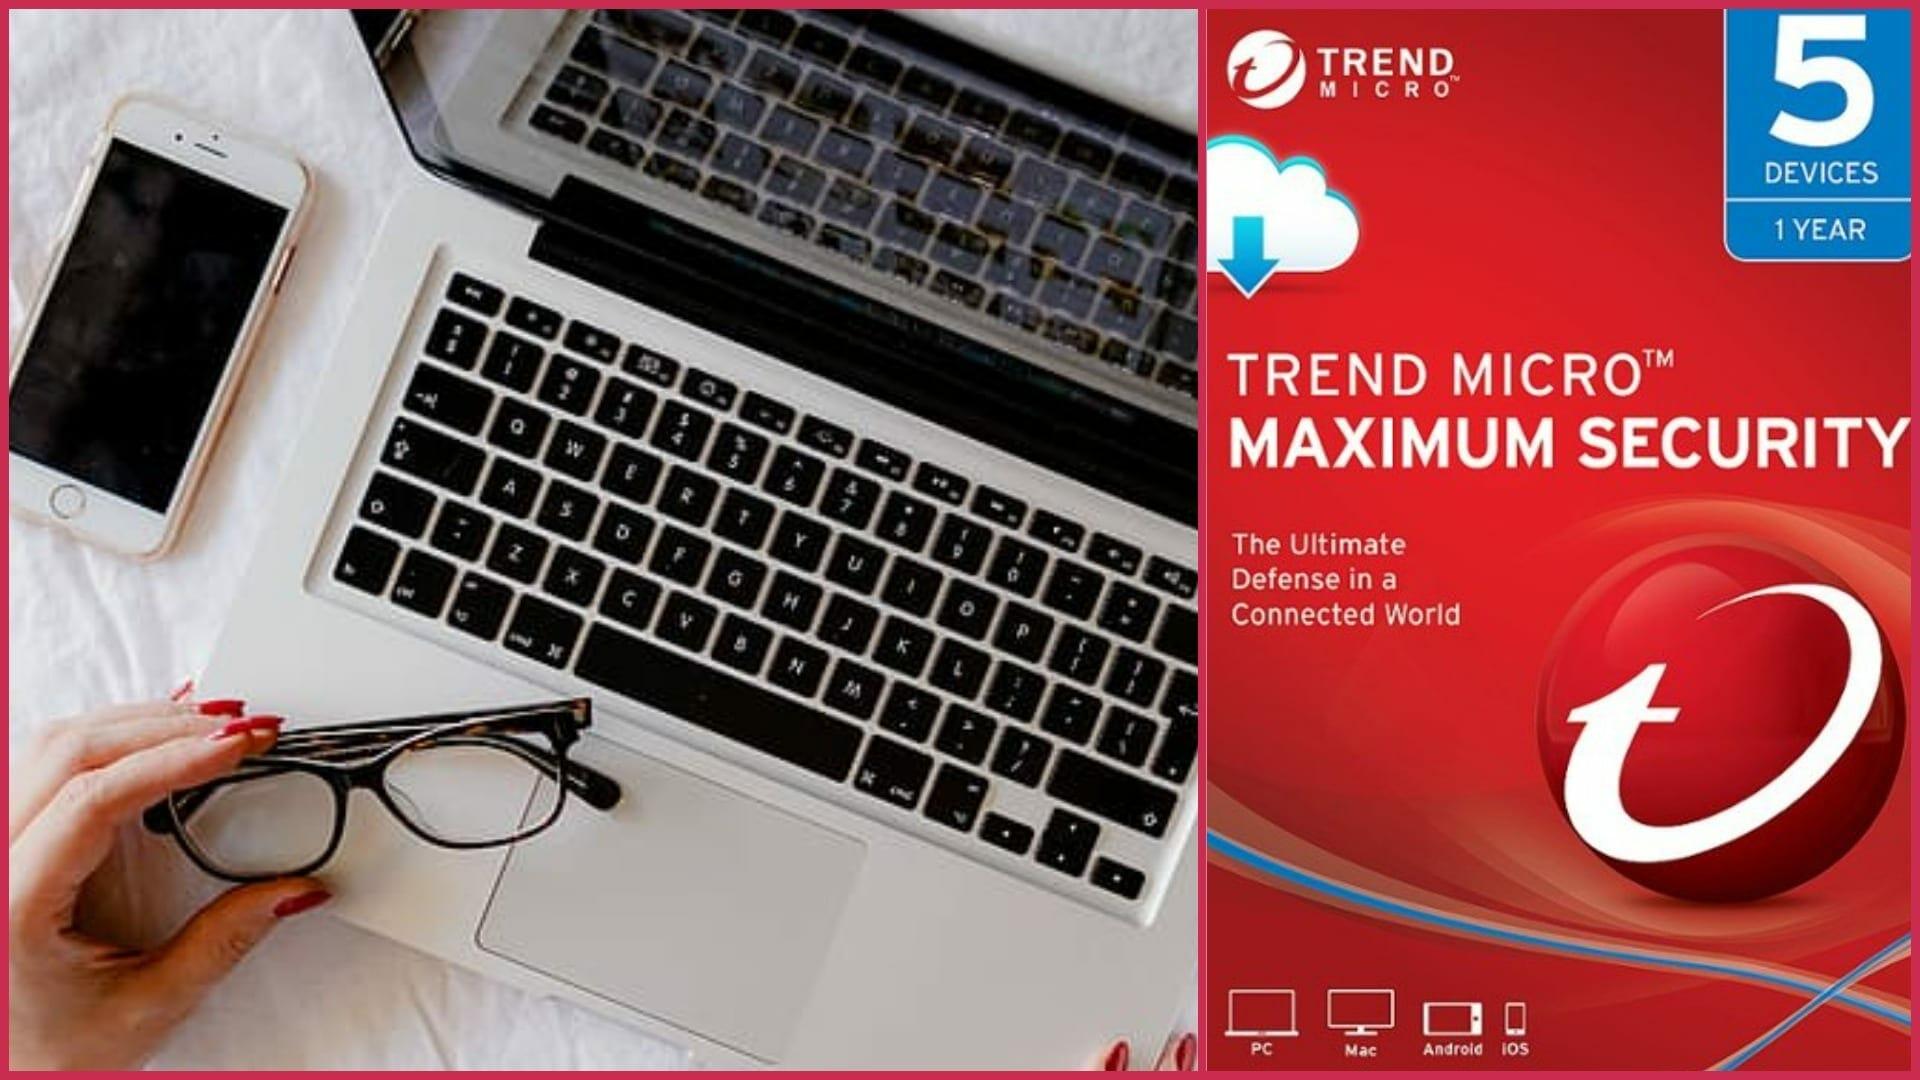 TrendMicro solutions